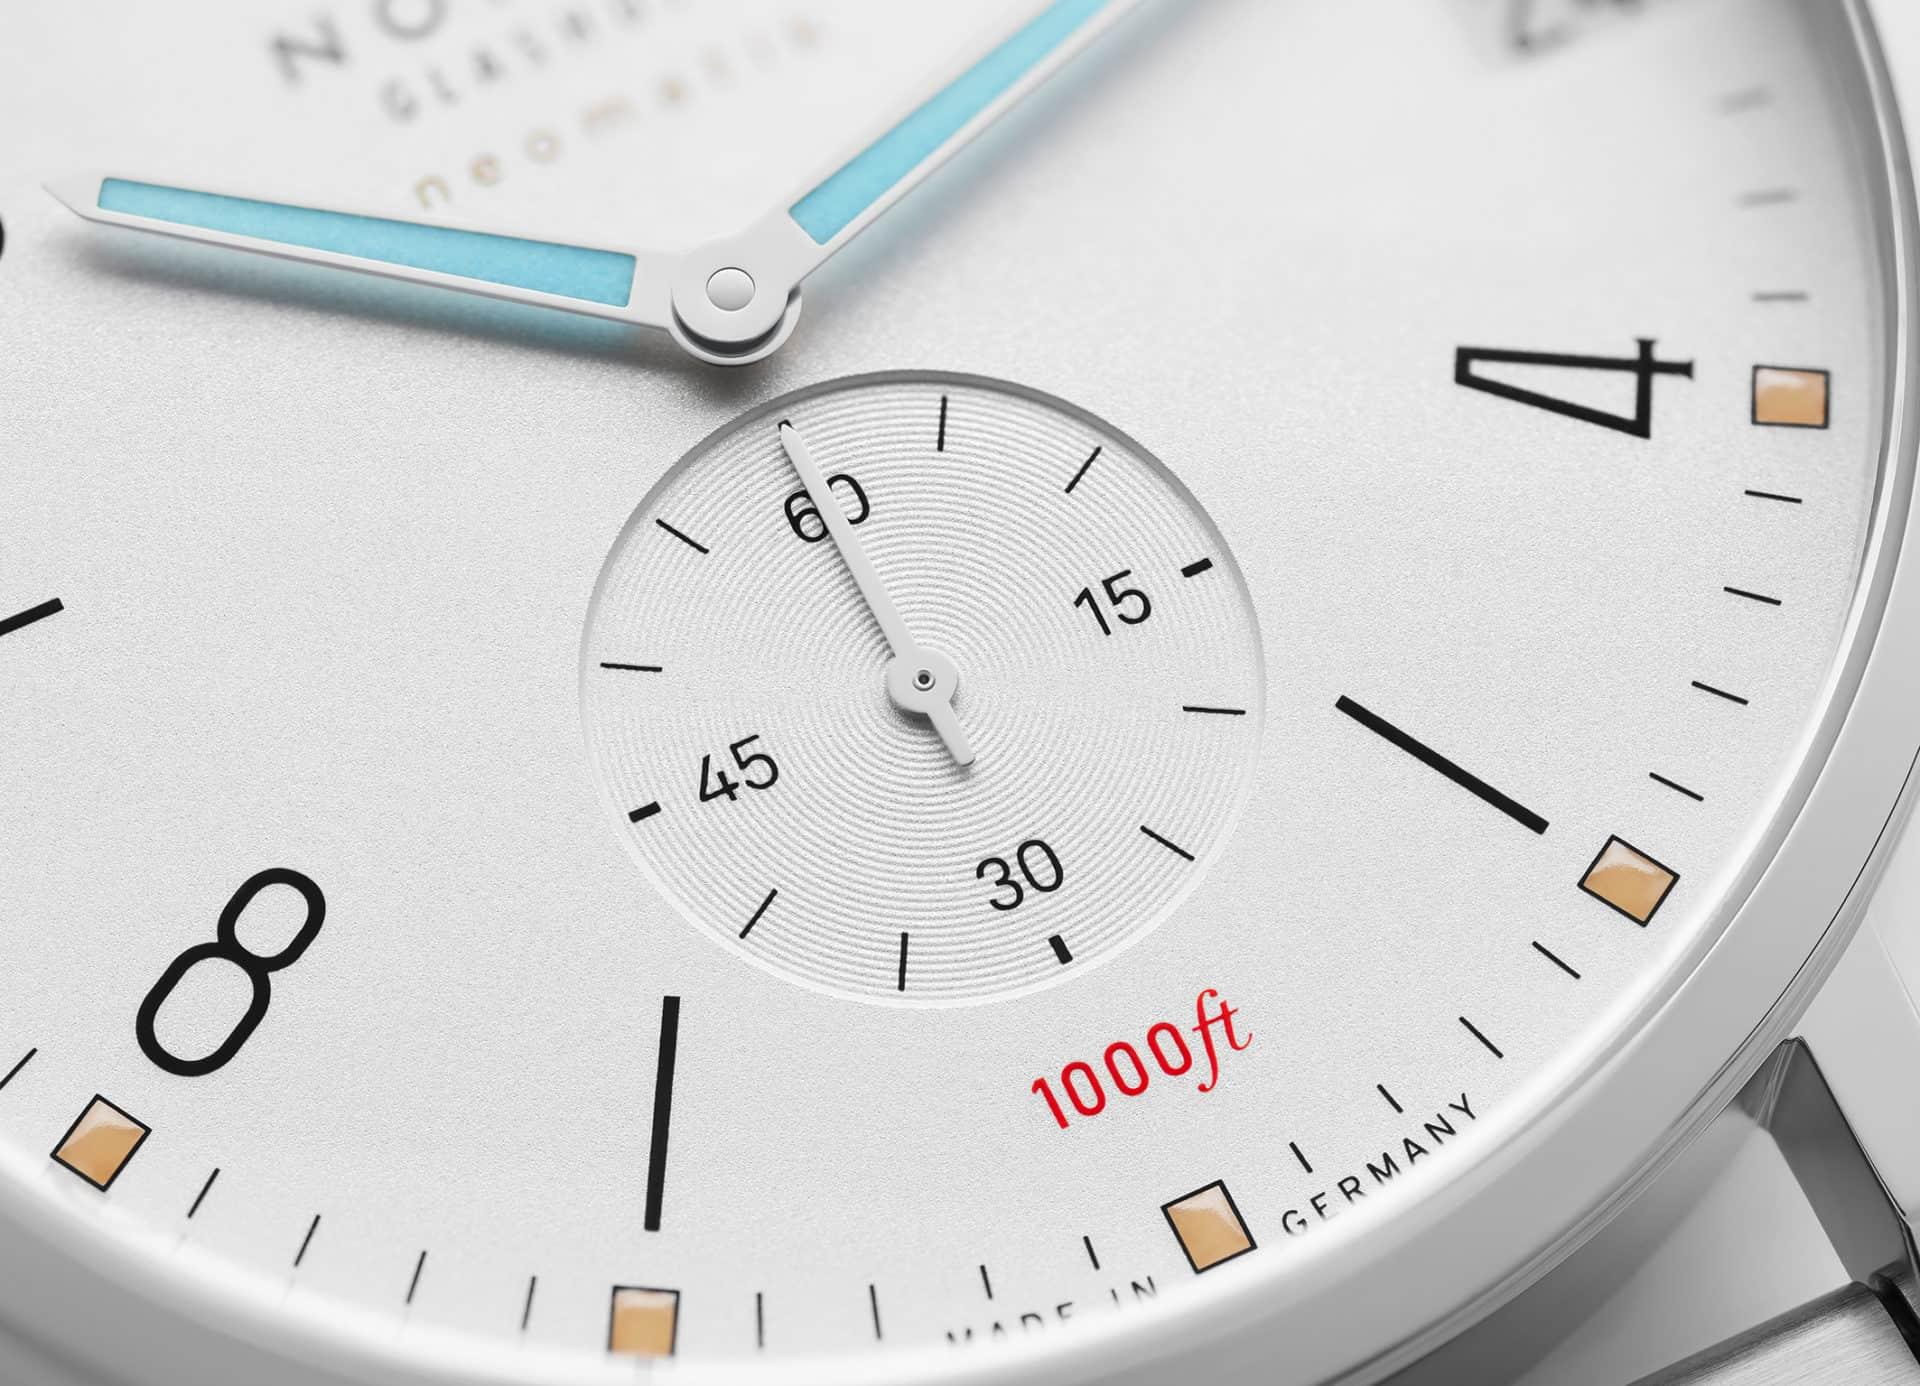 Chronometrische Dating-Techniken basieren auf Falsch Dating-Website Bewertungen